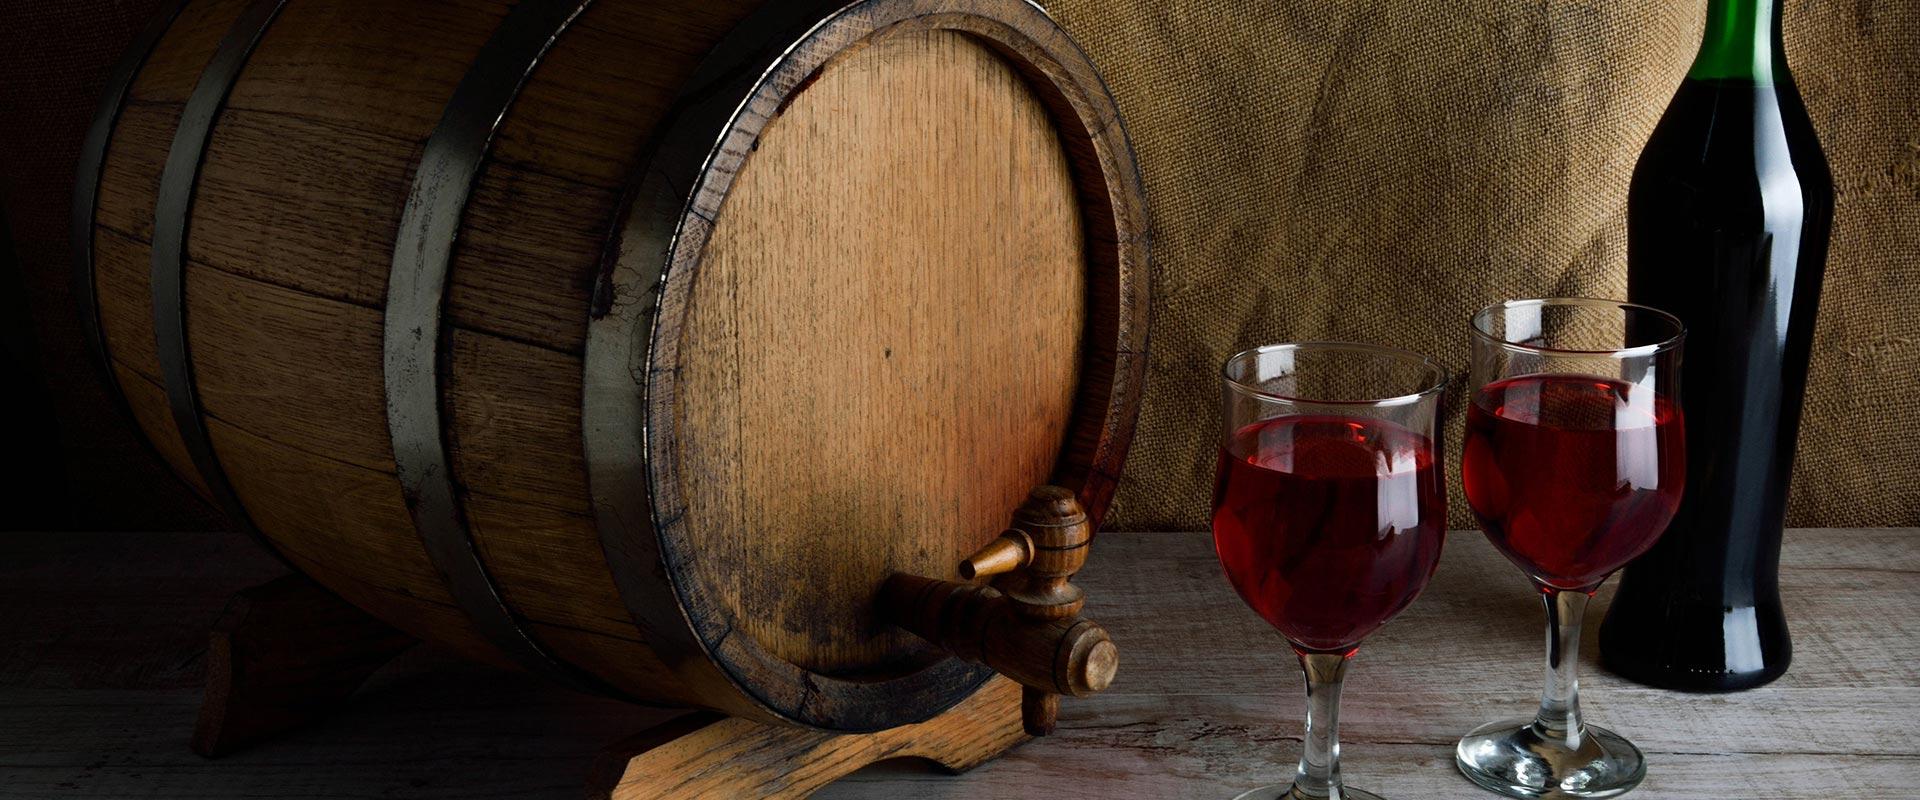 proposte vini